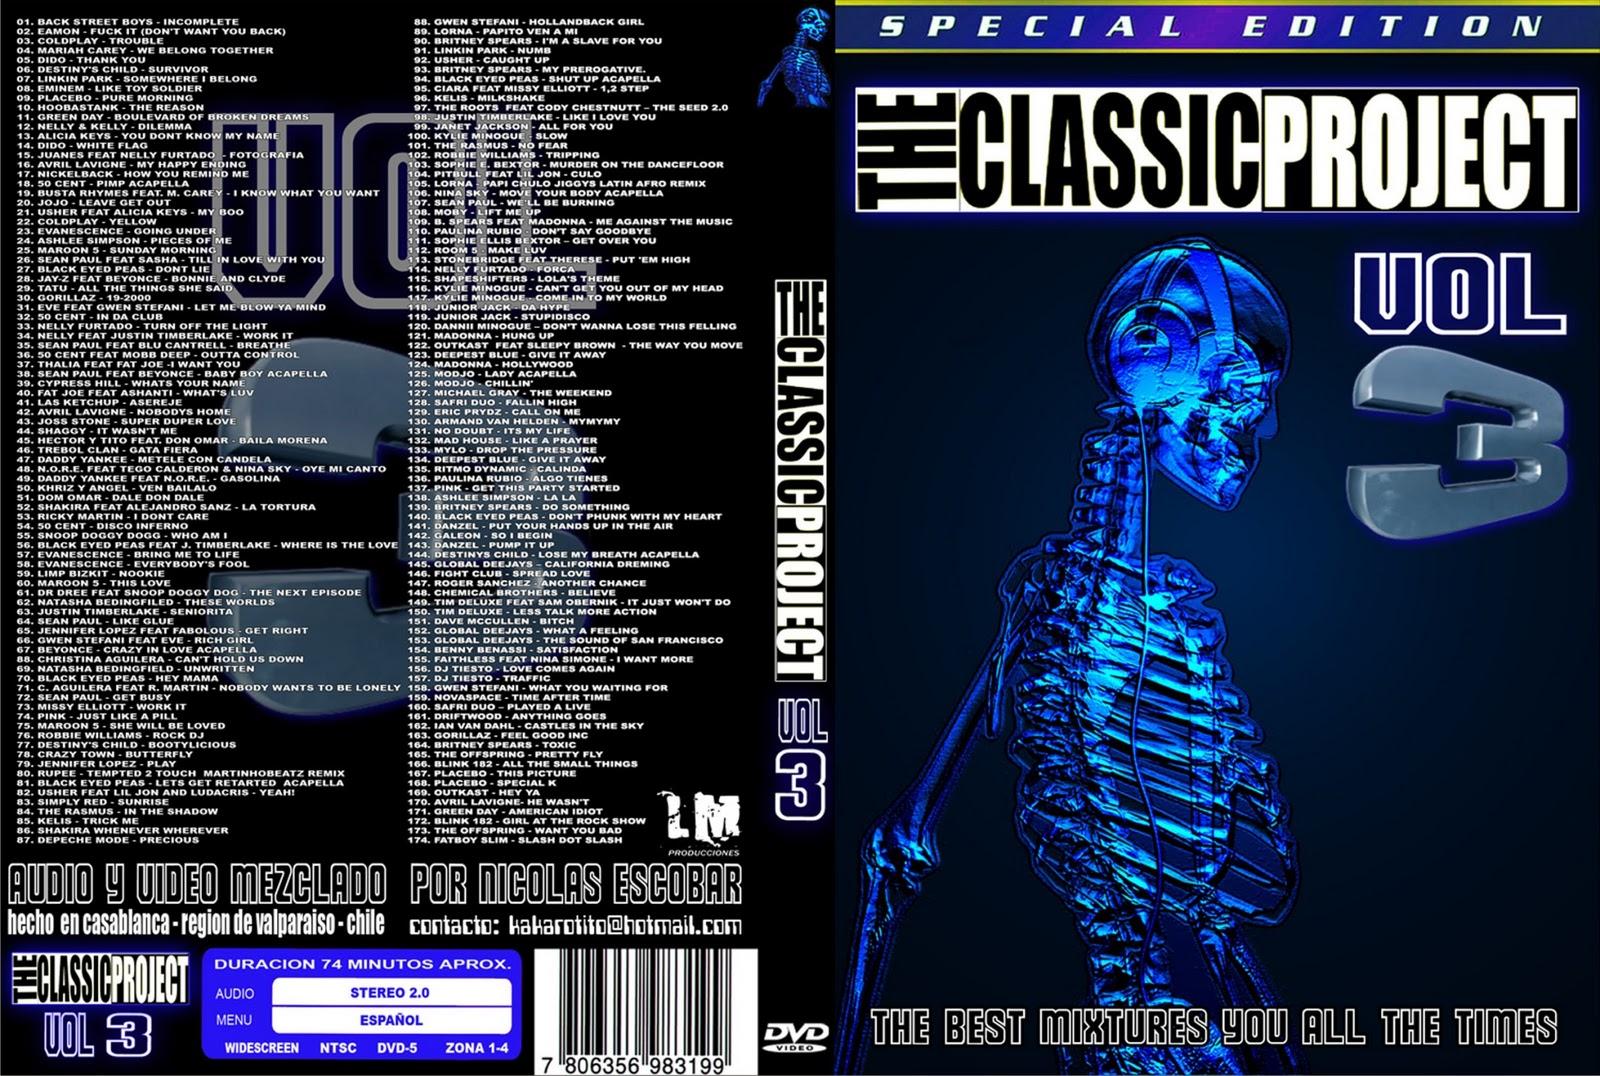 http://2.bp.blogspot.com/_IrbmmZfHTw0/TKjo1zmhOoI/AAAAAAAABNY/3347LwjfunI/s1600/(+2824+)++Classic+Projet+3+(+Mix+De+Videos+).jpg